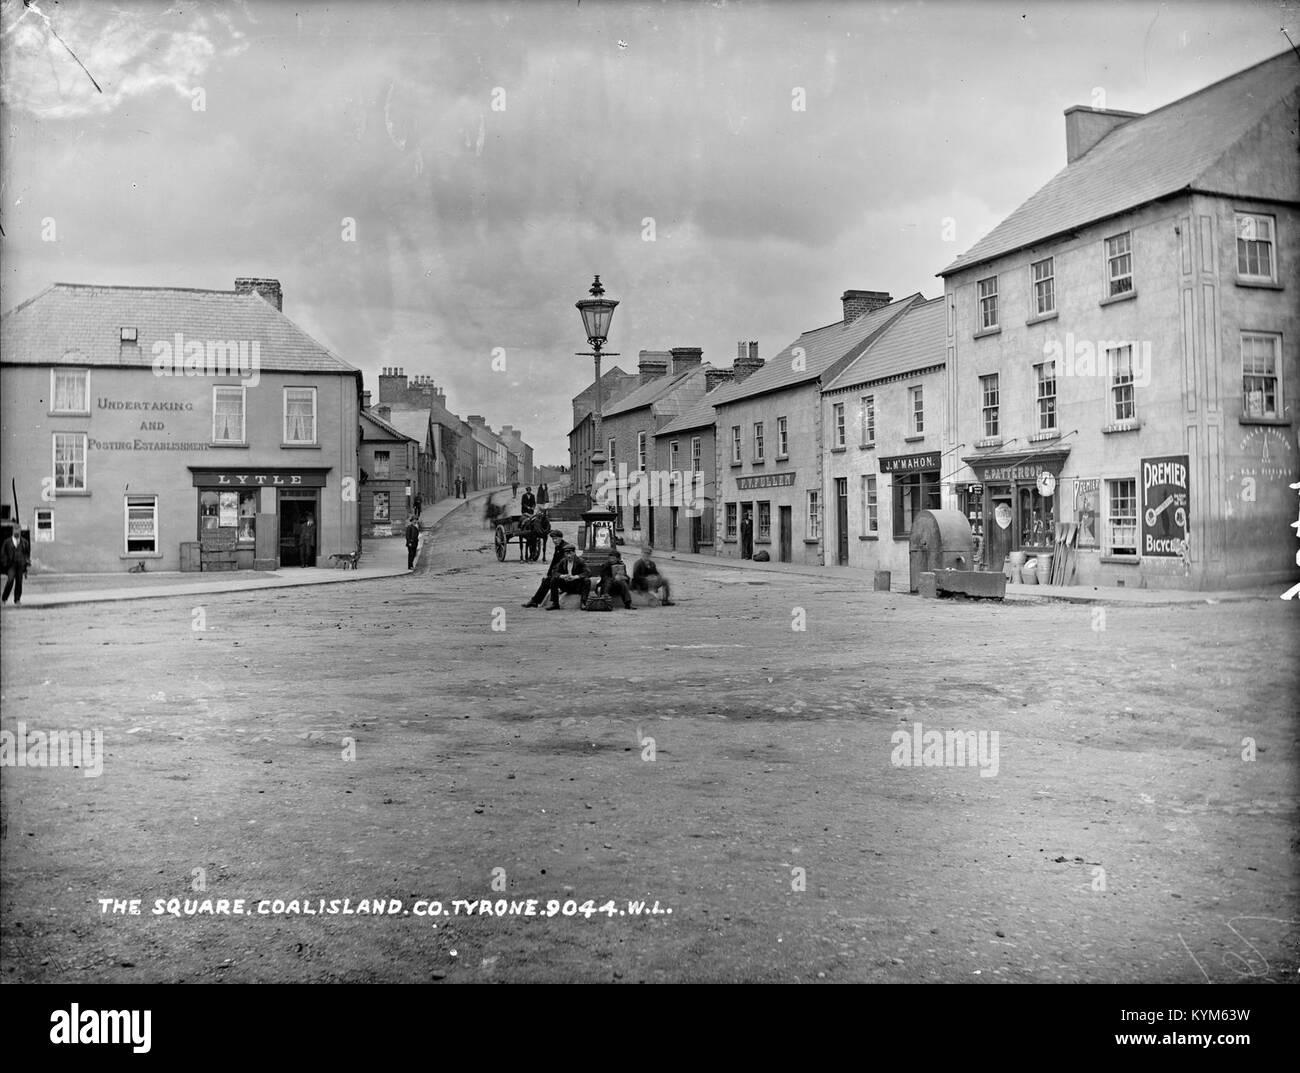 Square, Coalisland, Co Tyrone 37530514930 o - Stock Image